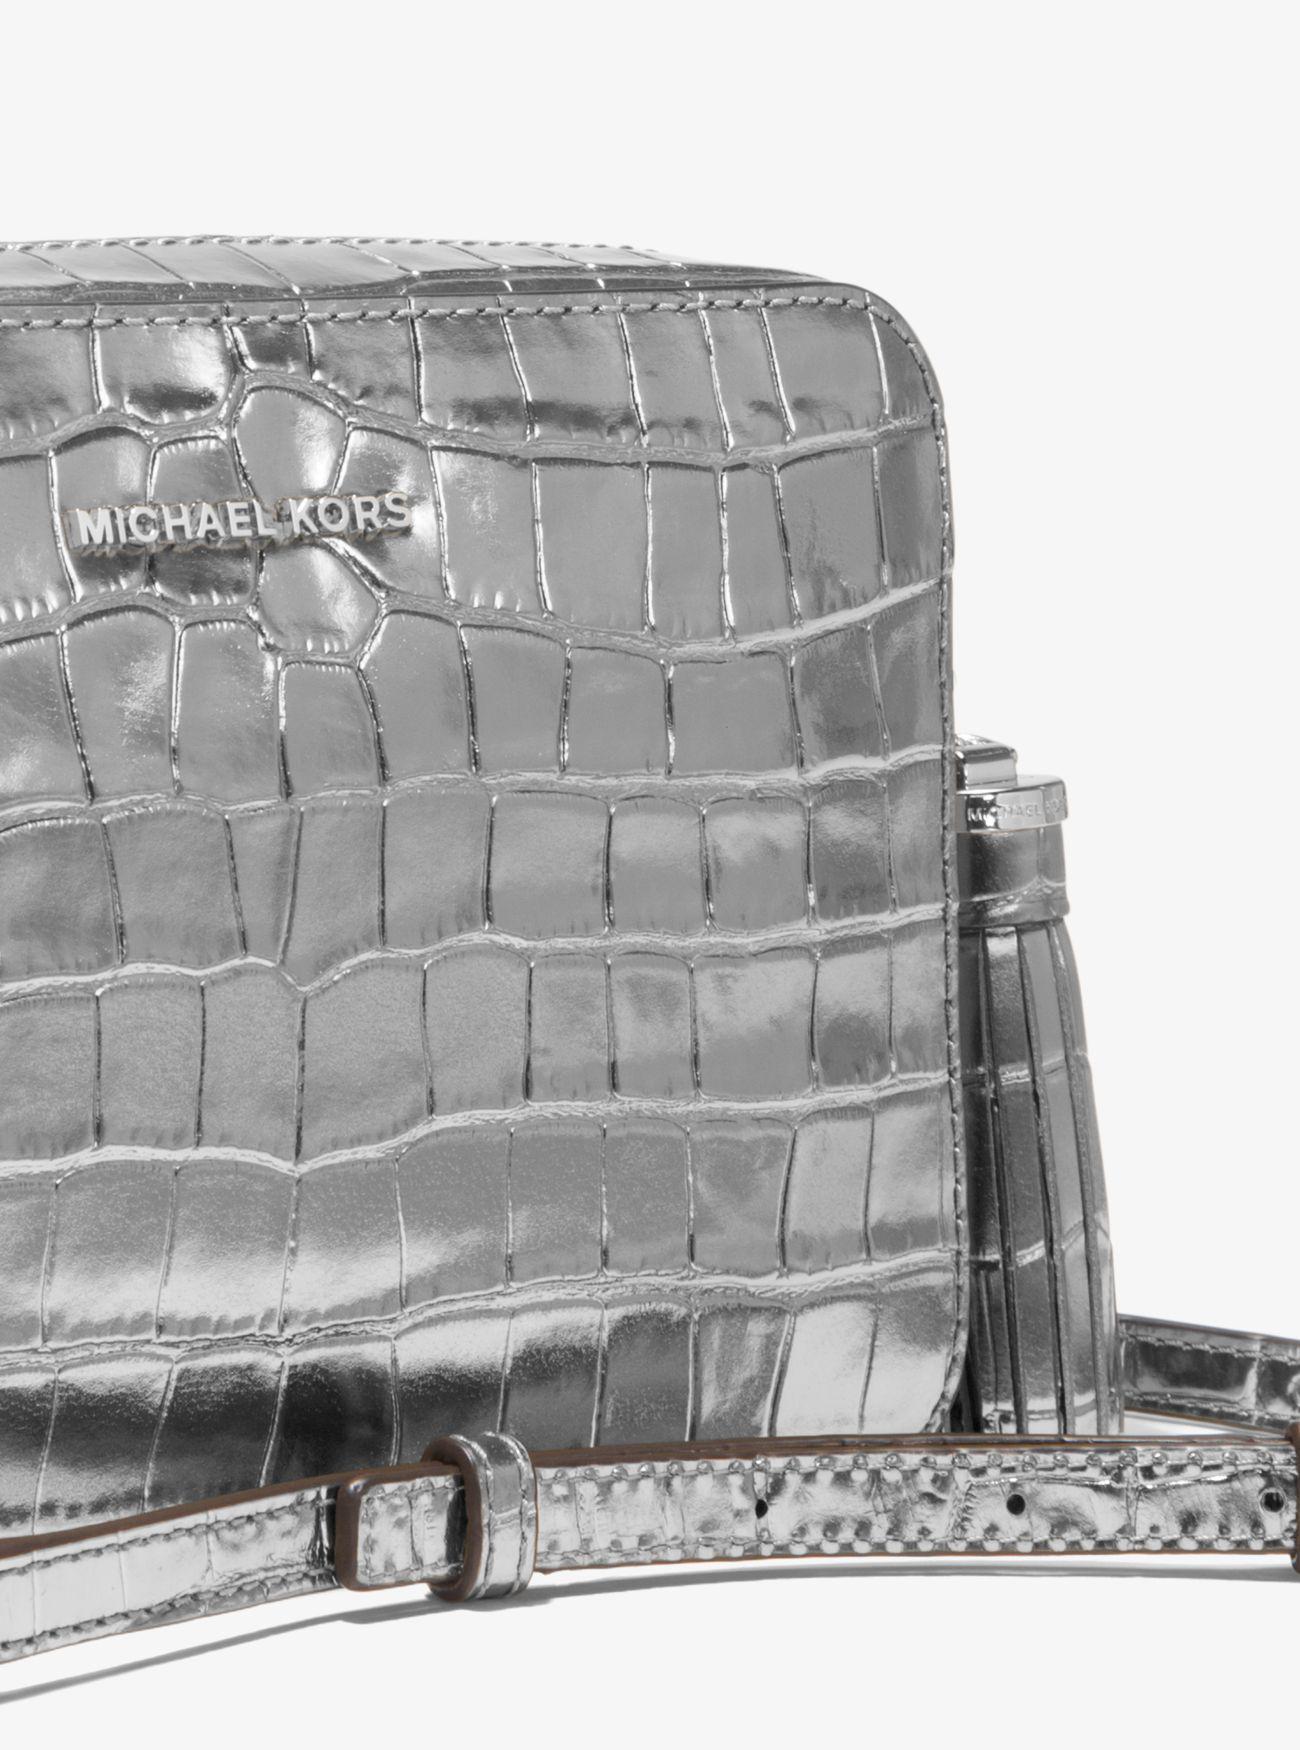 bf4f005b0e2f Lyst - Michael Kors Ginny Metallic Embossed-leather Crossbody in ...